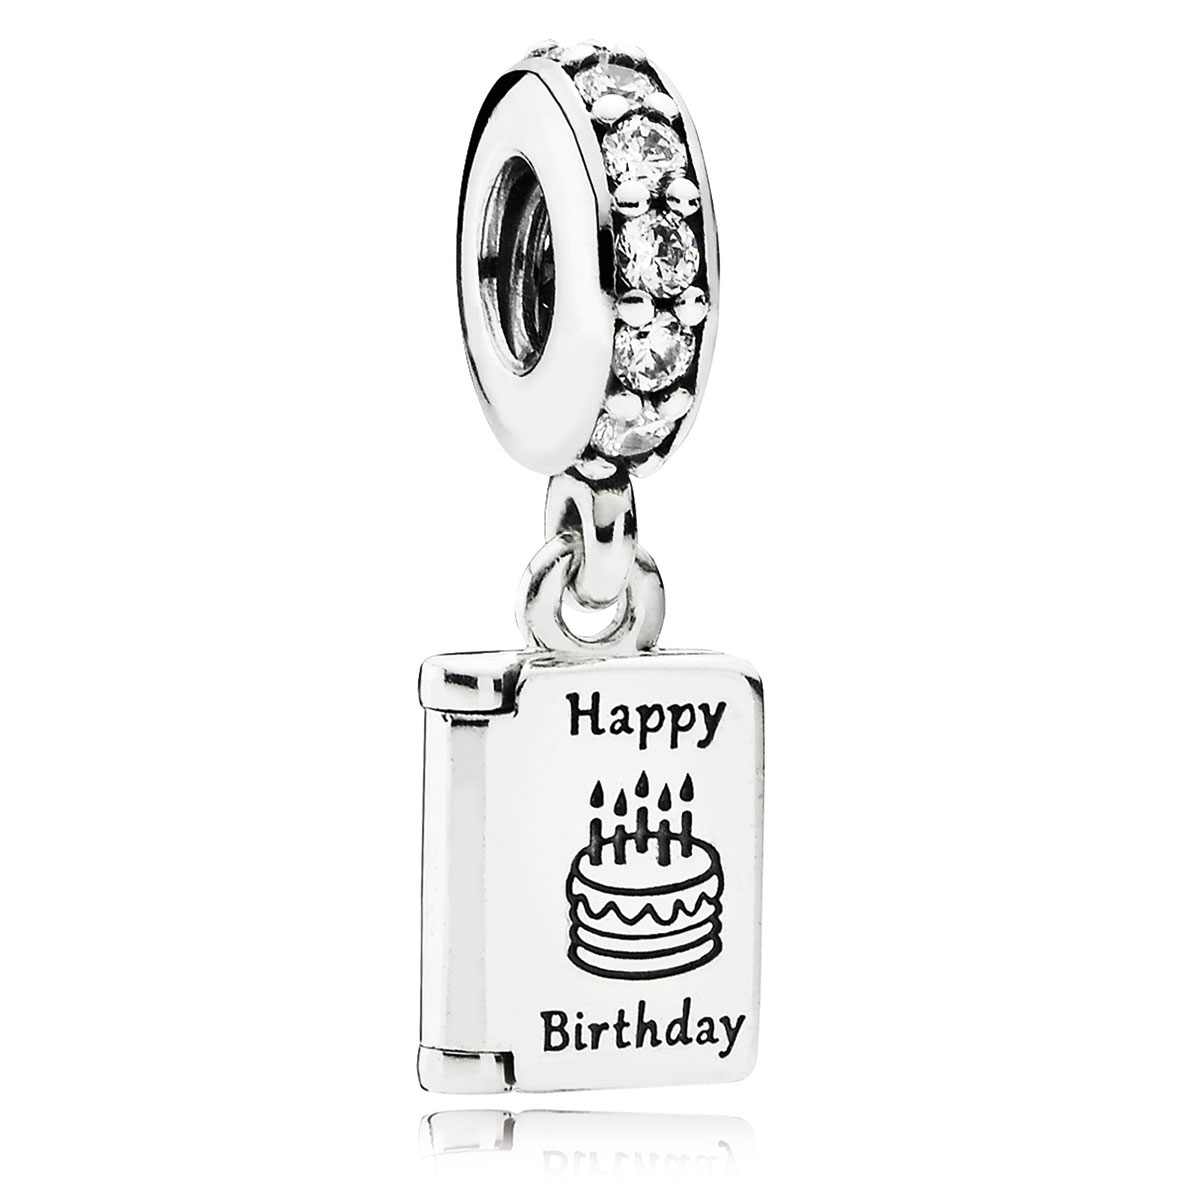 Pleasant Pandora Happy Birthday Charm Mypanjewelry Com Birthday Cards Printable Opercafe Filternl